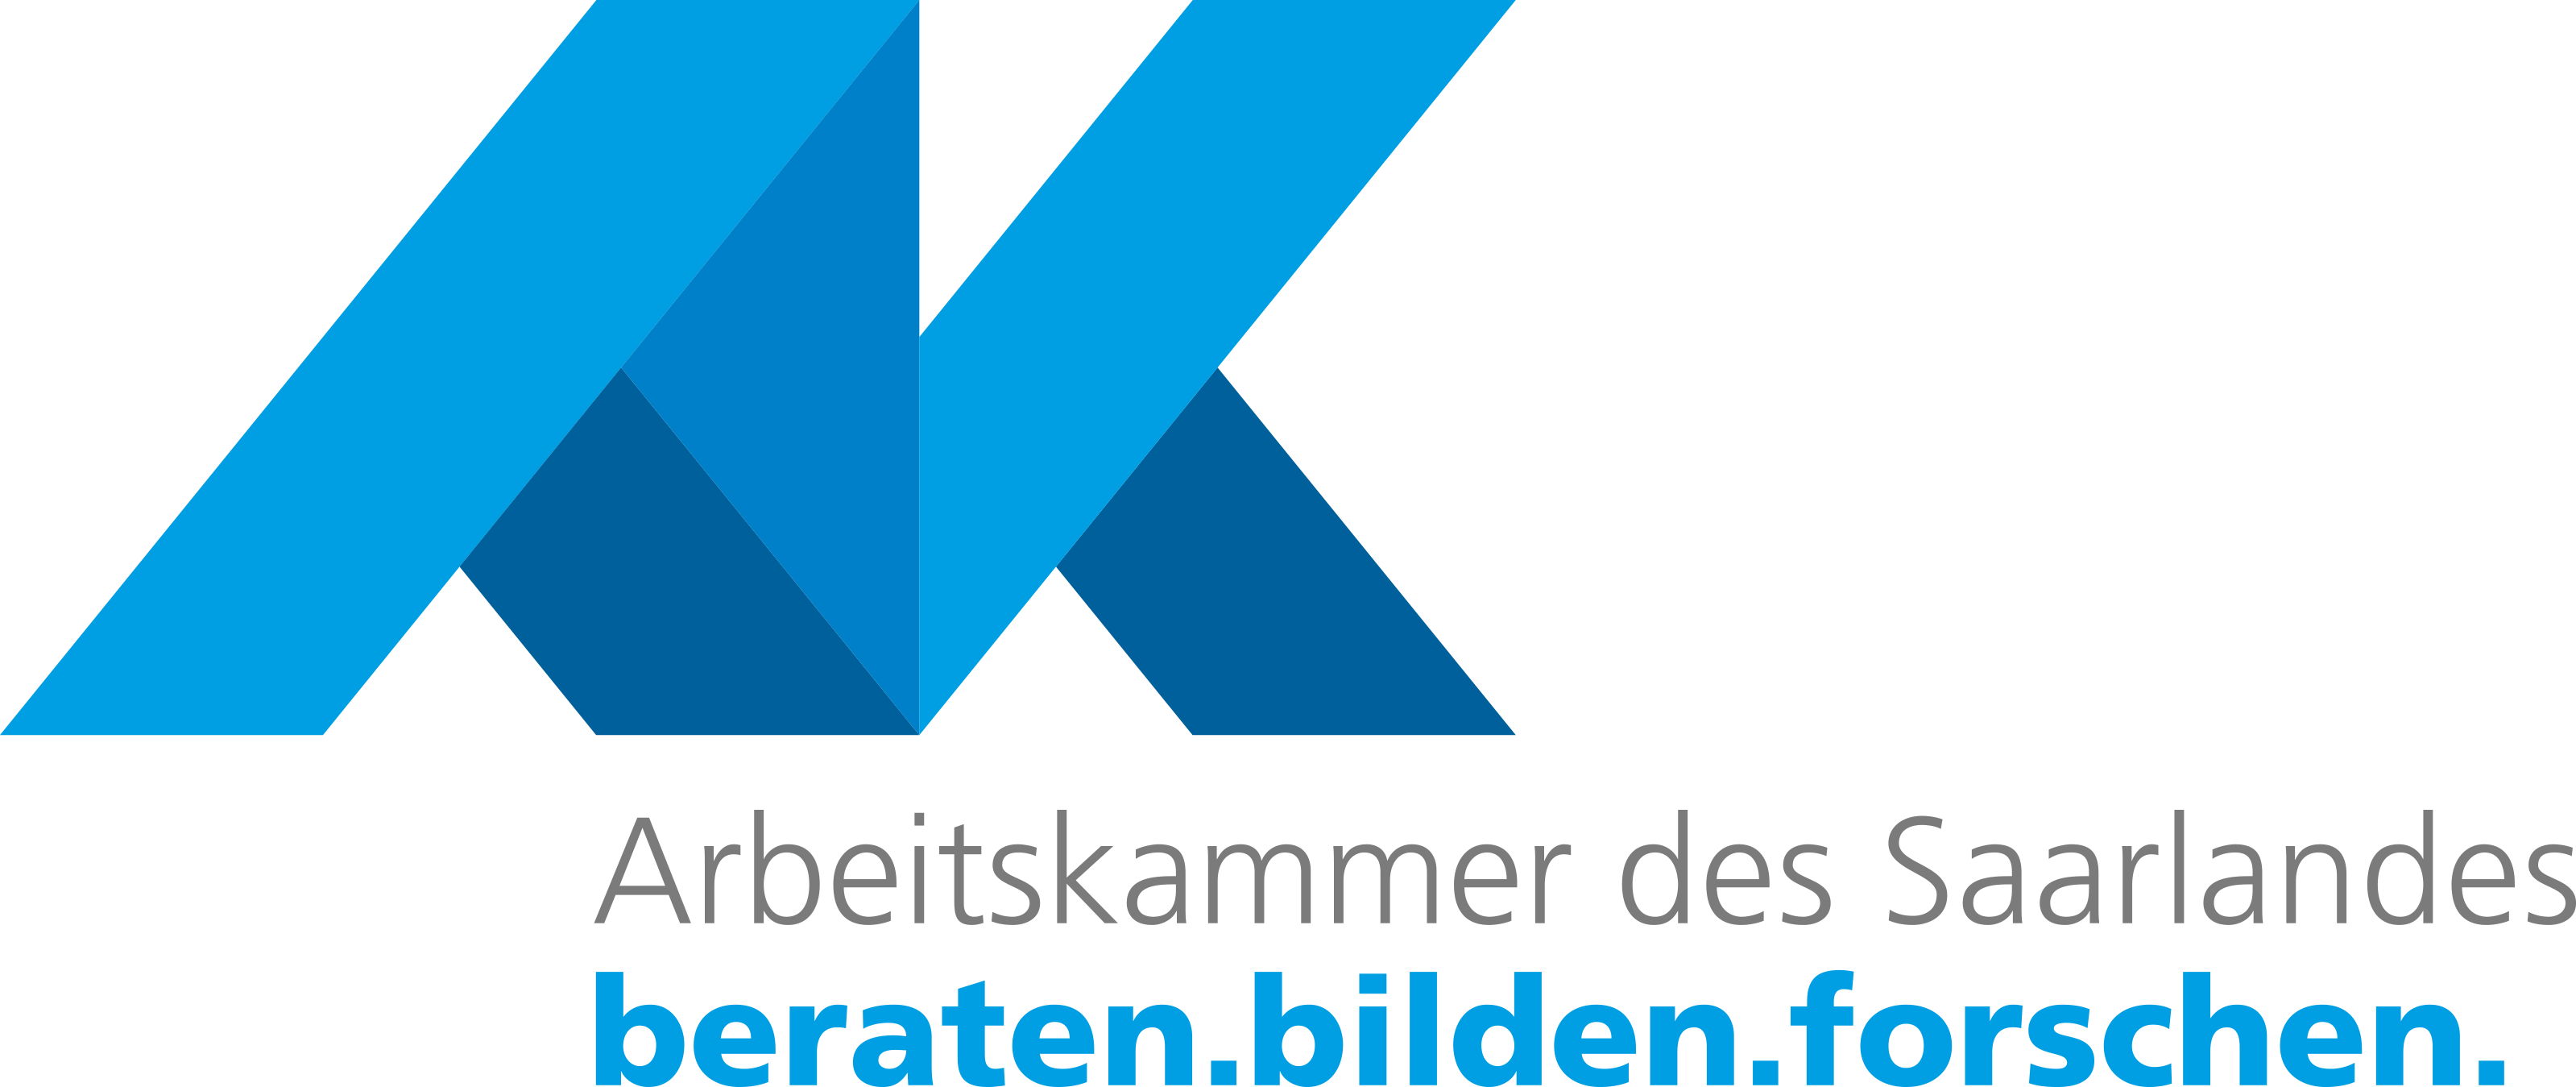 Arbeitskammer Saarland Logo